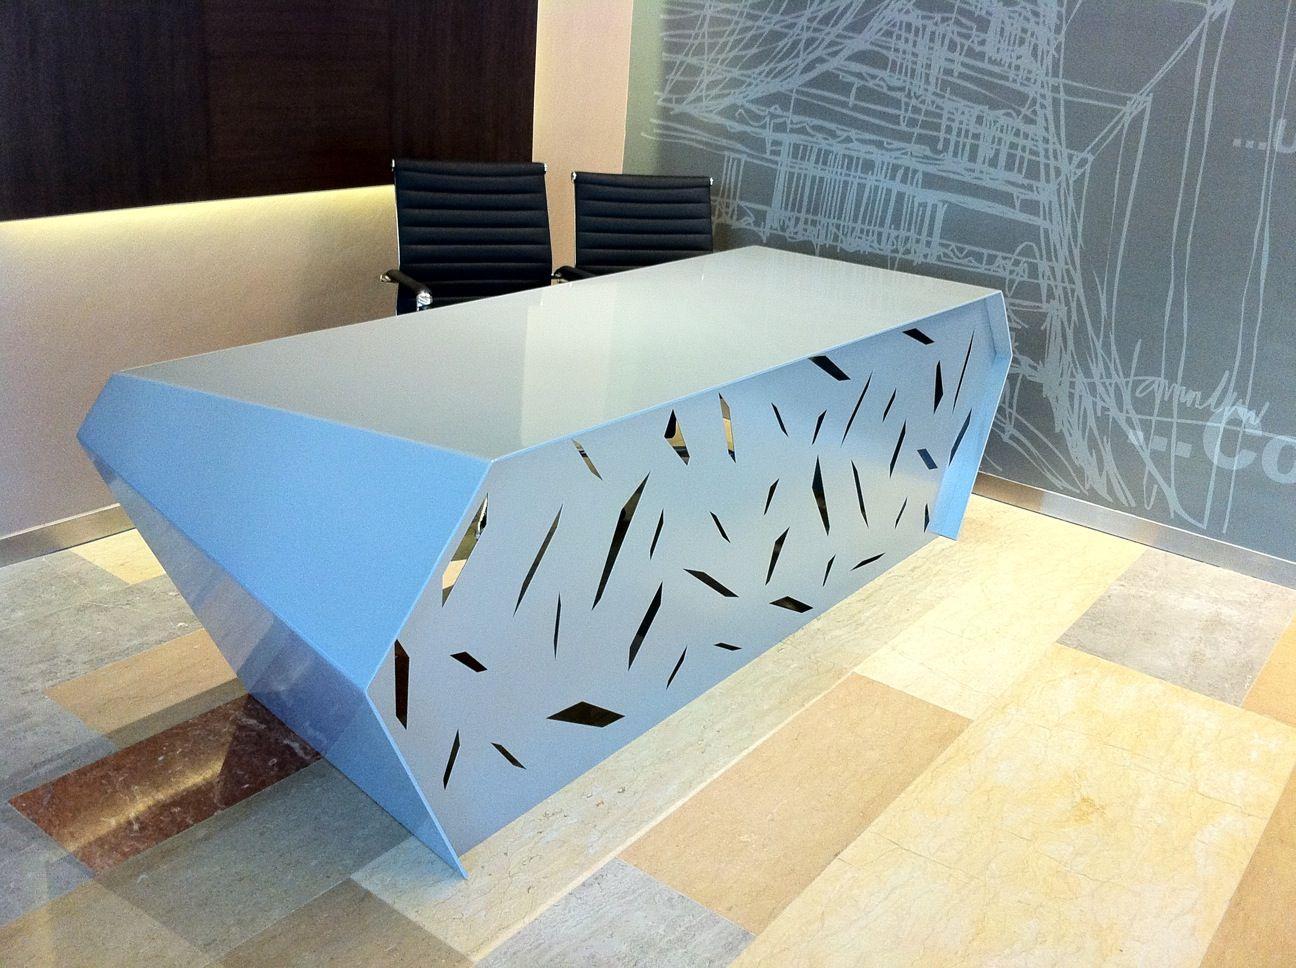 Furniture | Desks | PAC Desk by ARKTURA | [1] | Pinterest | Desks ... - Furniture | Desks | PAC Desk by ARKTURA